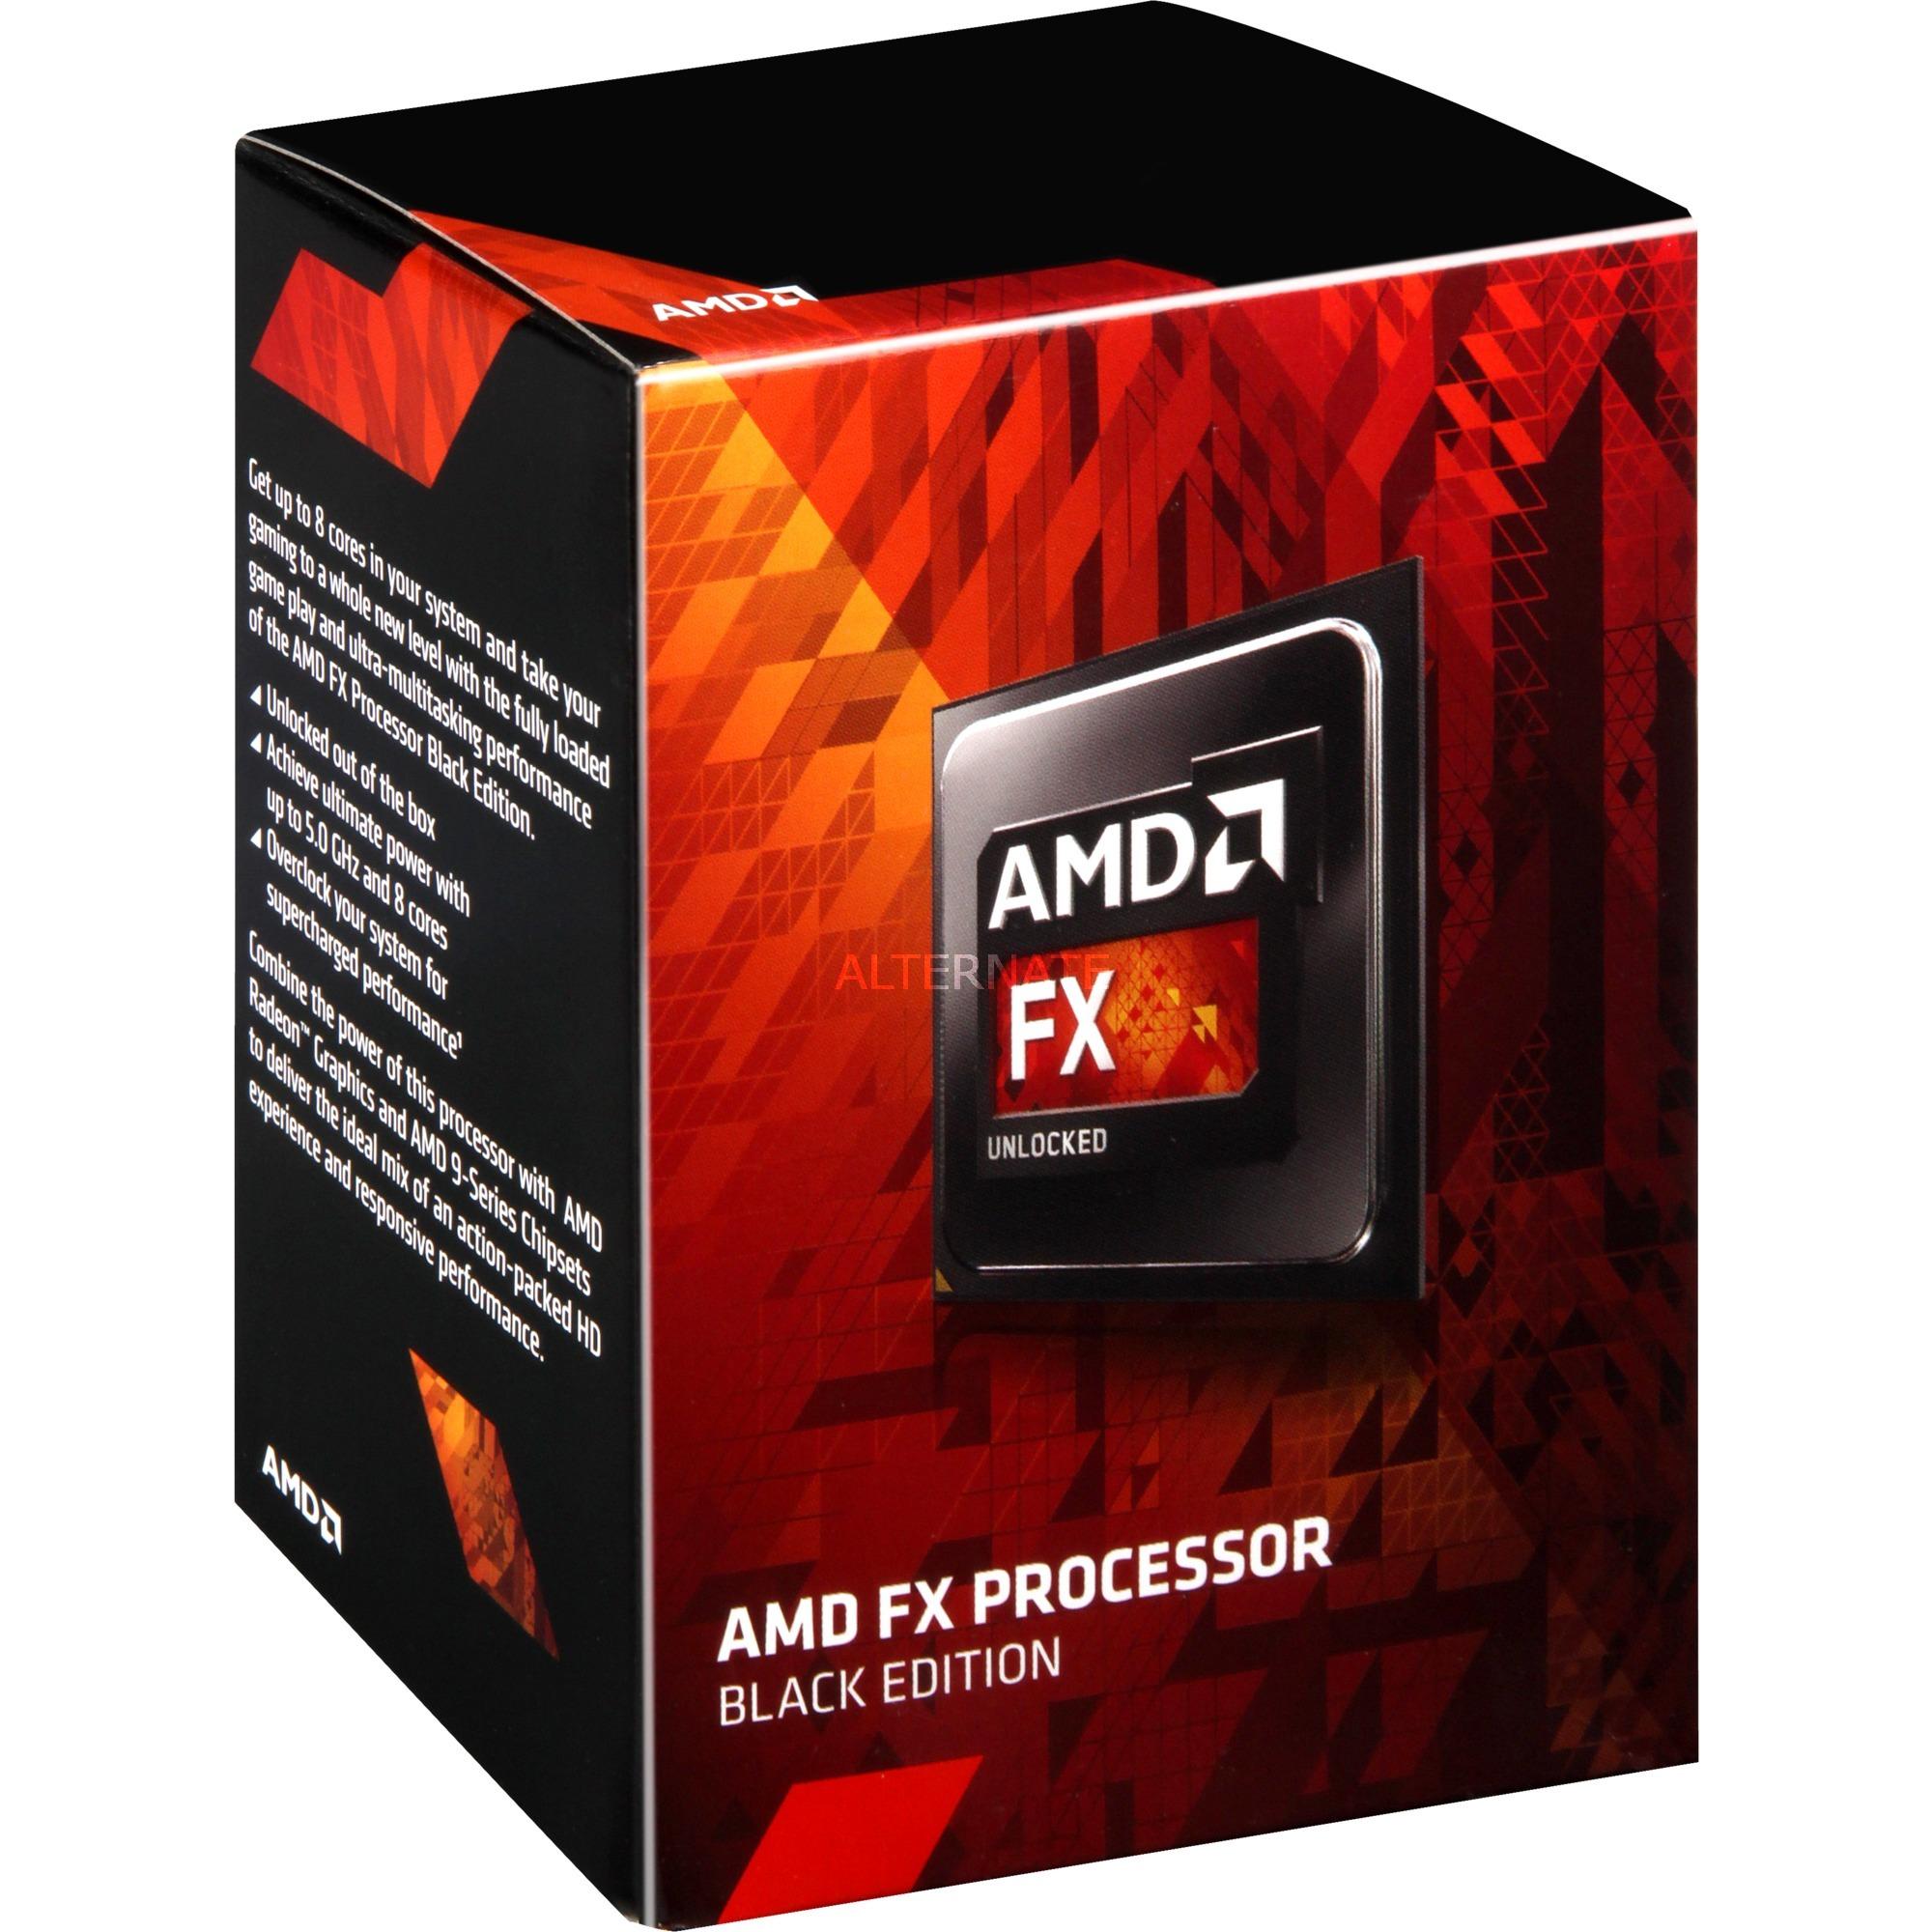 amd fx 8300 Amd FX 8300 Overlock | Community